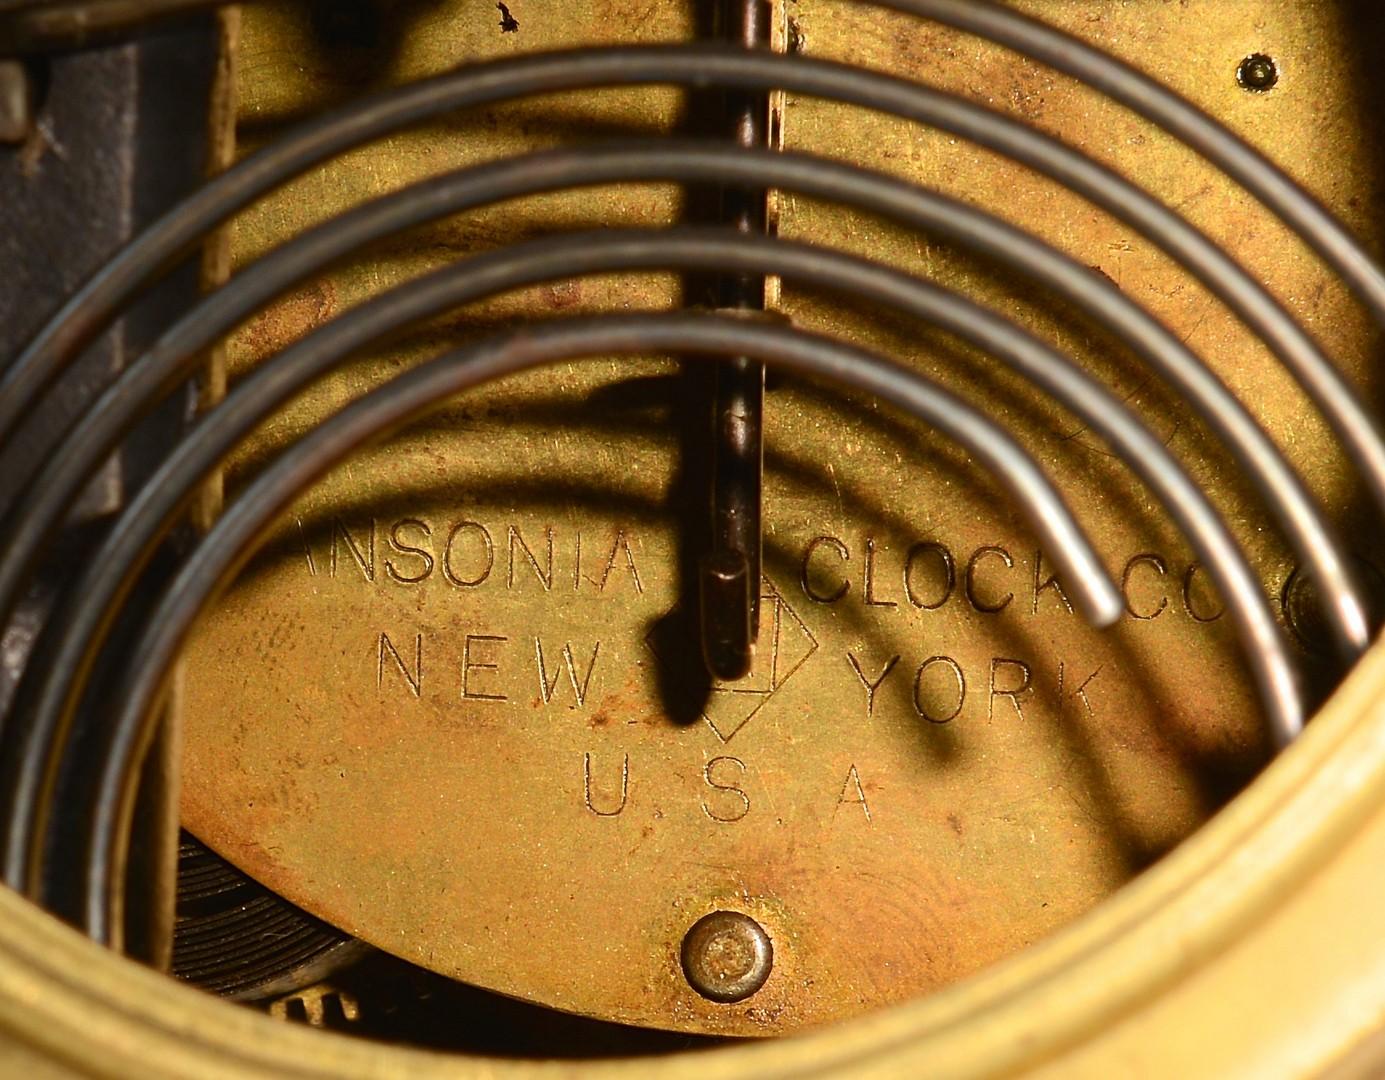 Lot 626: Pair of mantel clocks, Astonia & Royal Bonn